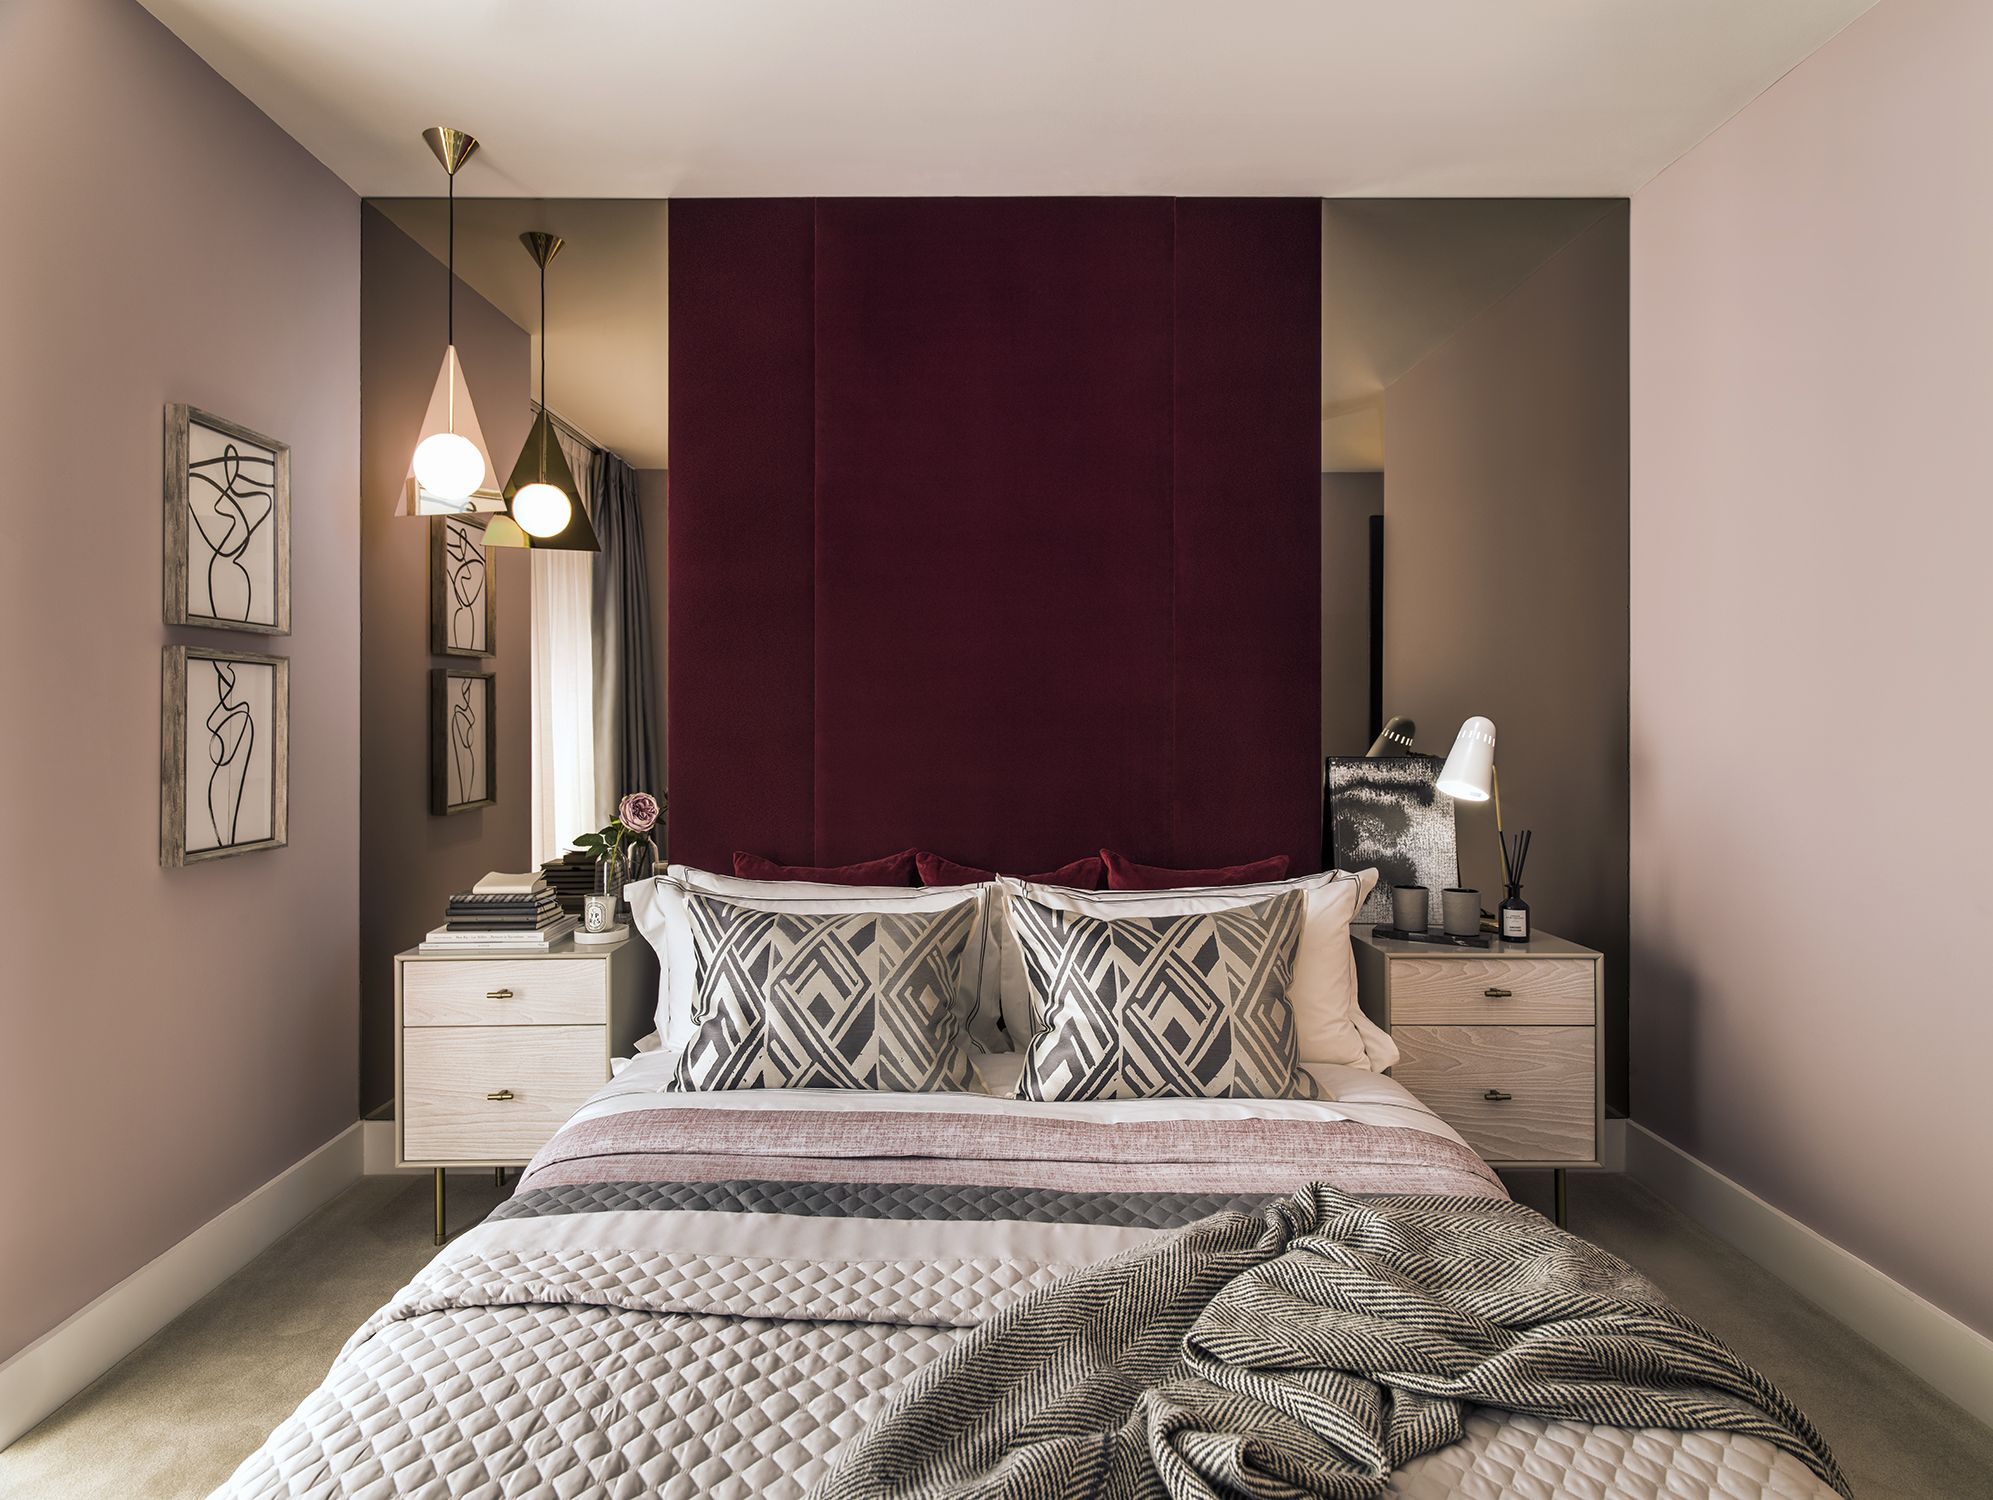 Fabrica,Keybridge,Secondary Bedroom